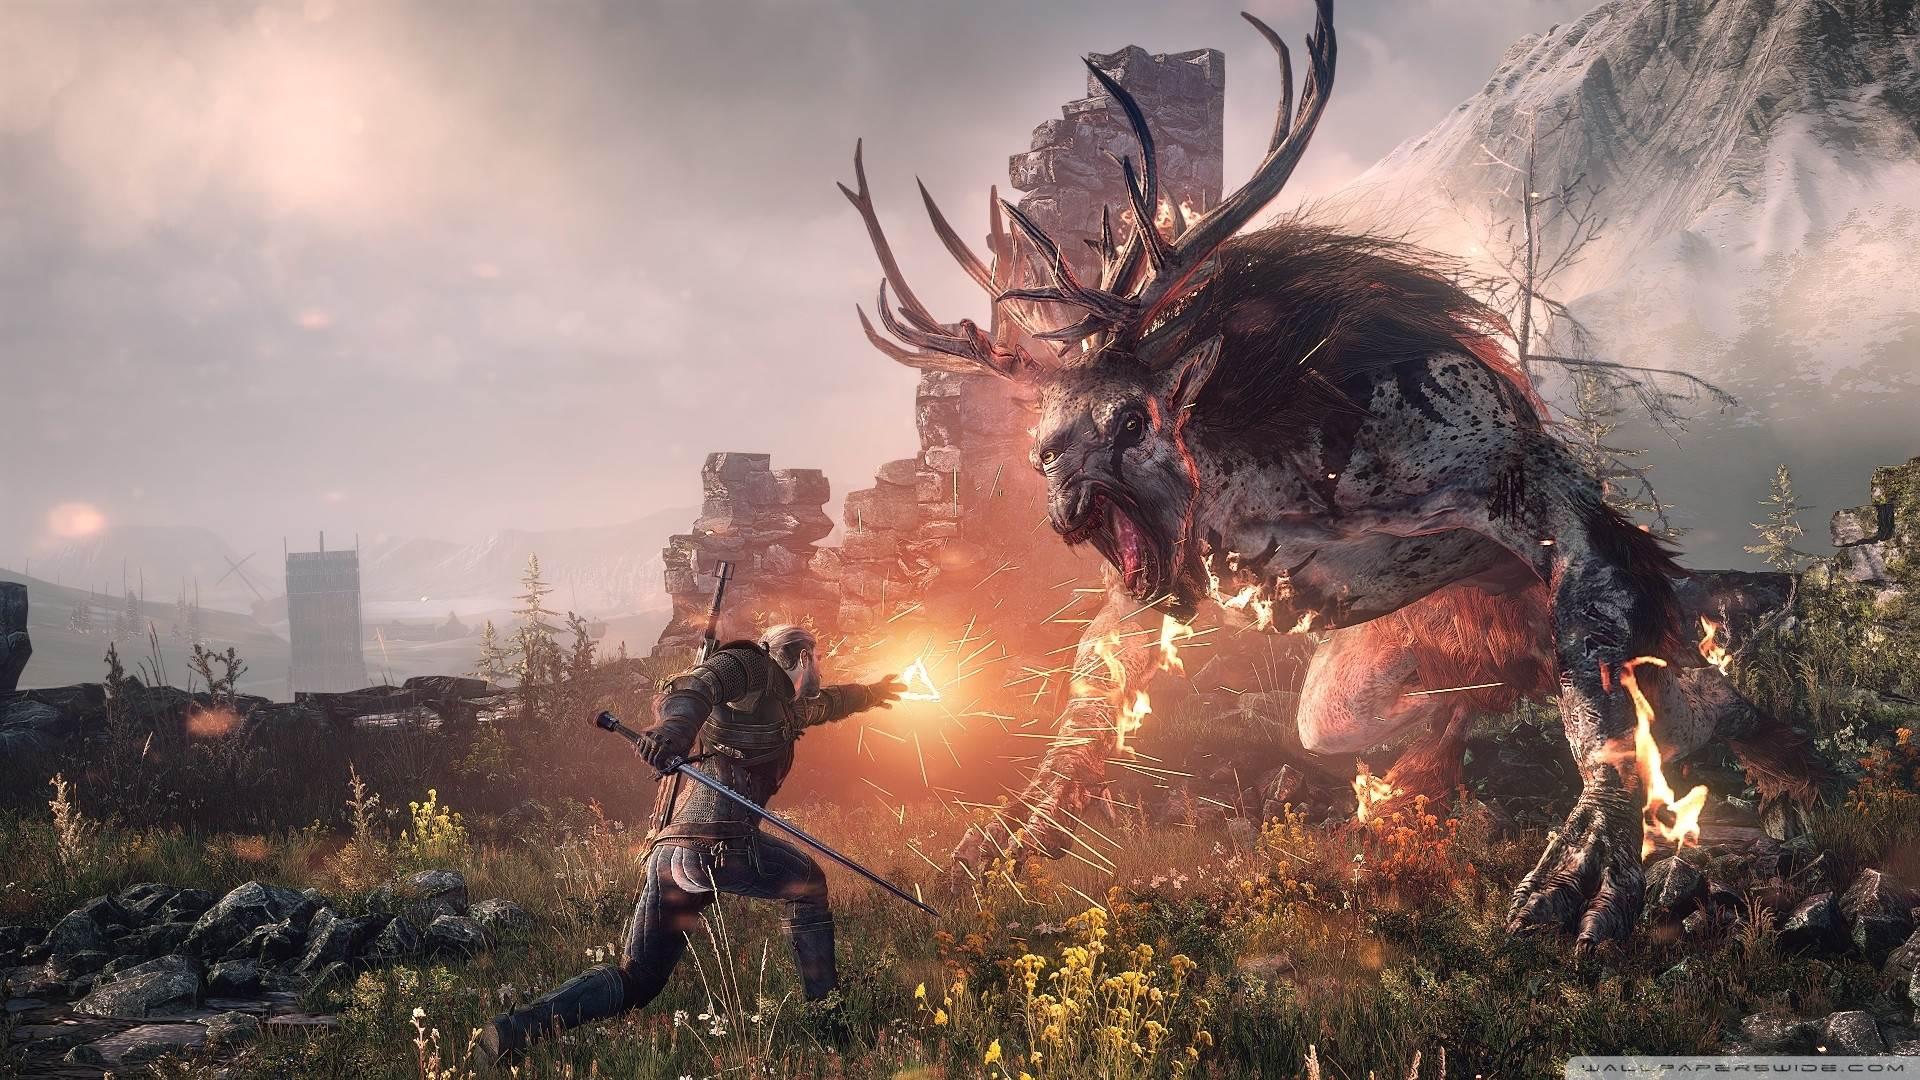 The Witcher 3 Wild Hunt Geralt Fighting The Fiend Hd Desktop